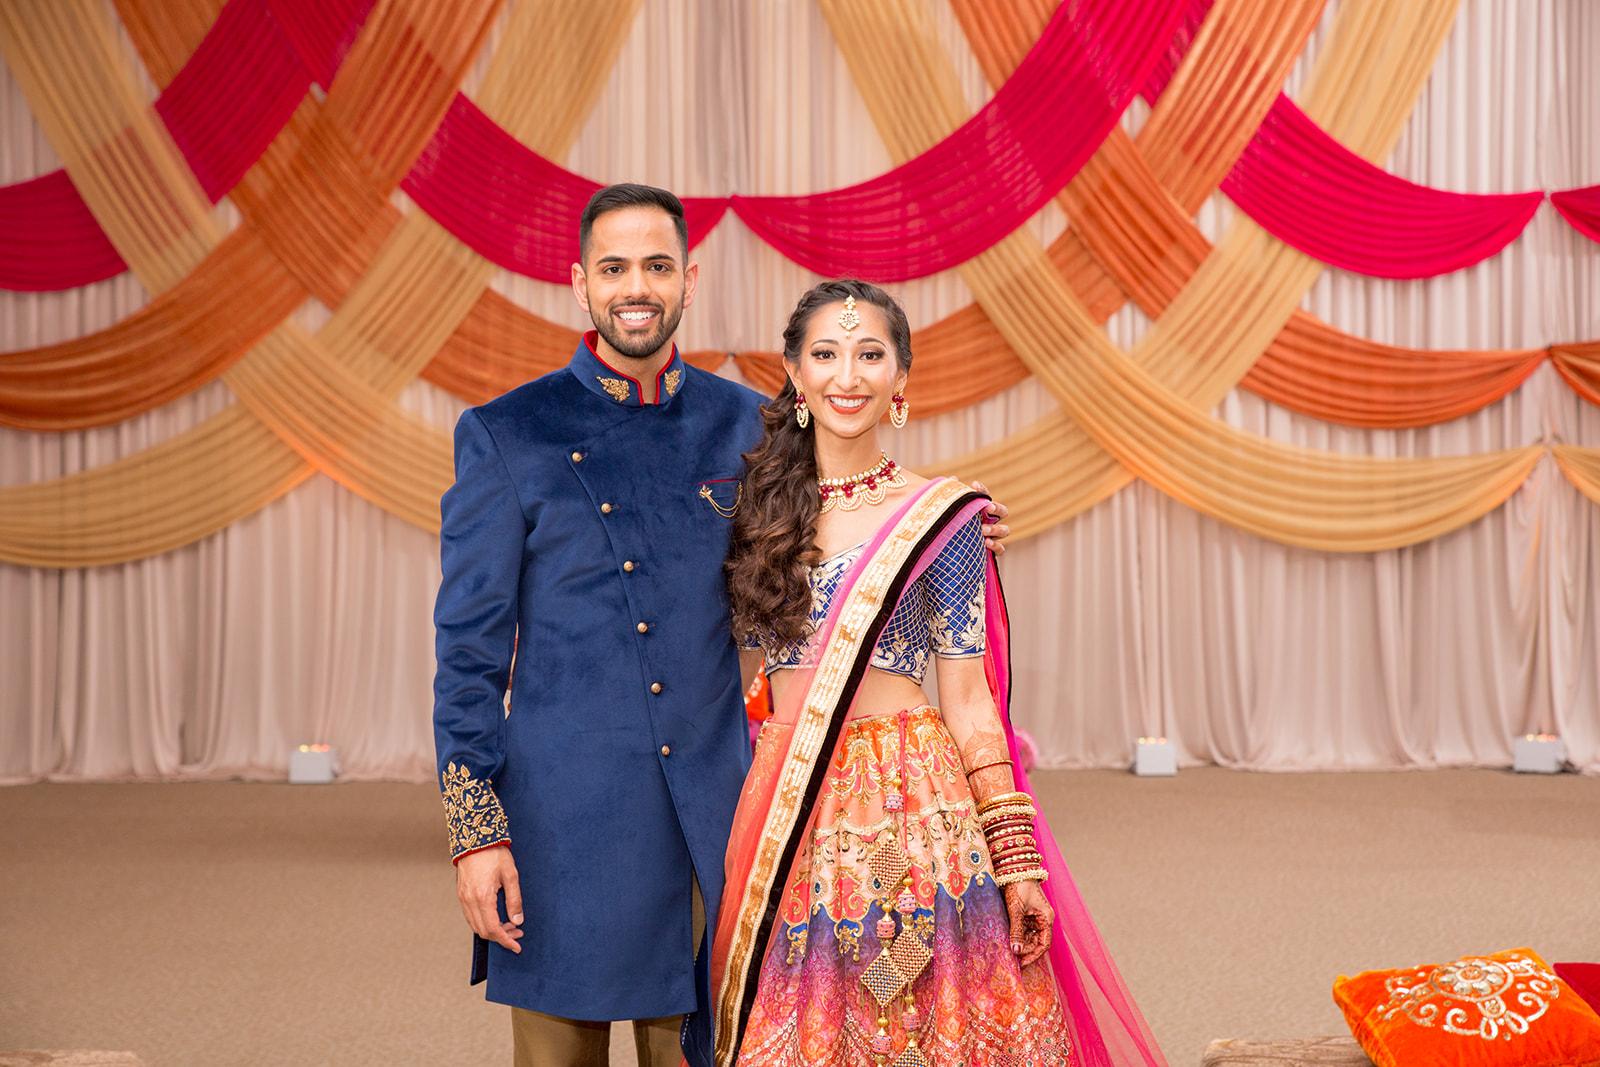 Le Cape Weddings - Puja and Kheelan - Garba A   -93.jpg